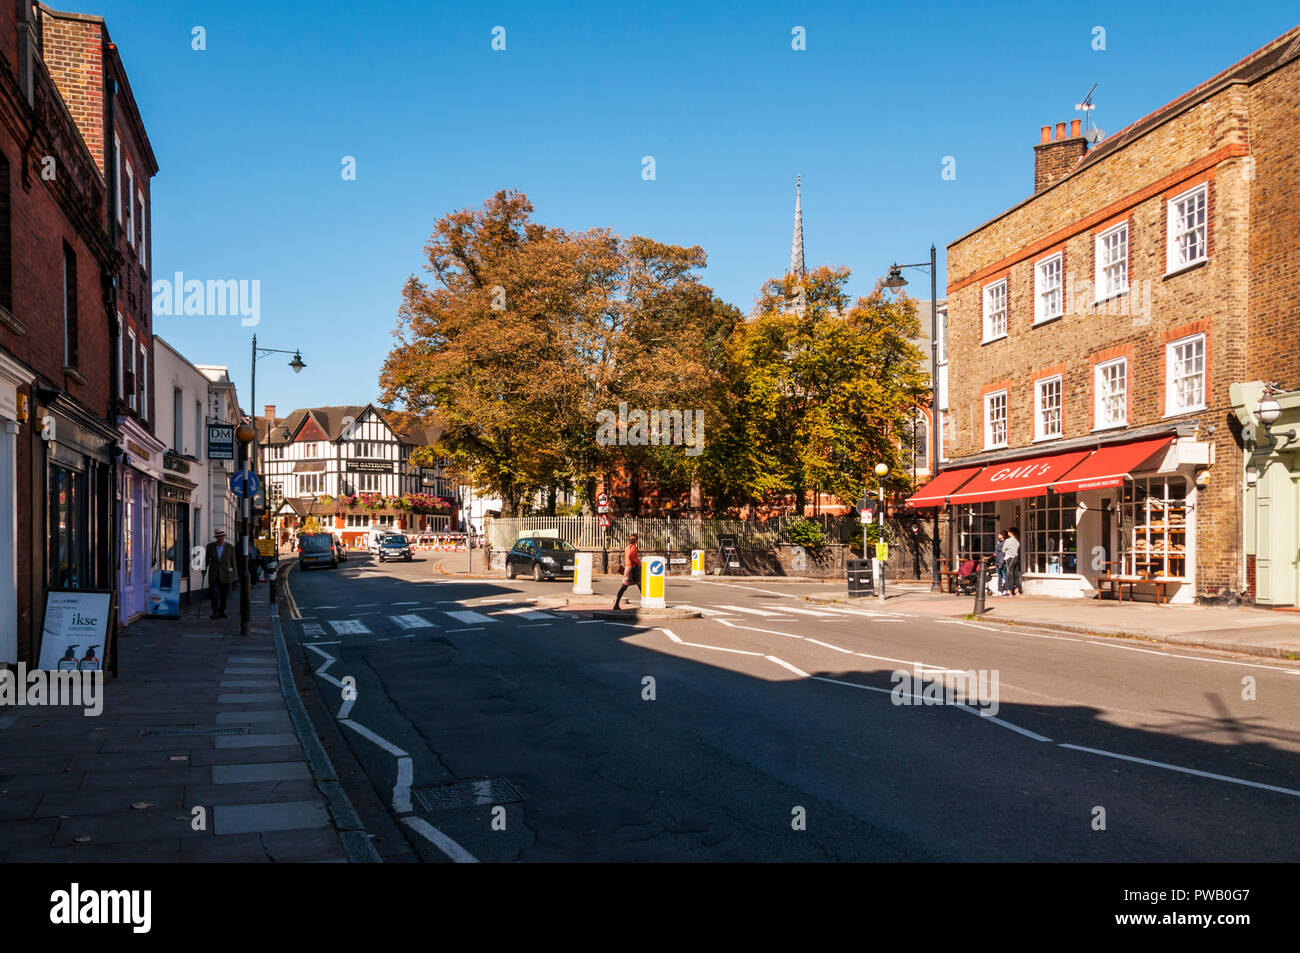 High Street, Highgate Village. - Stock Image